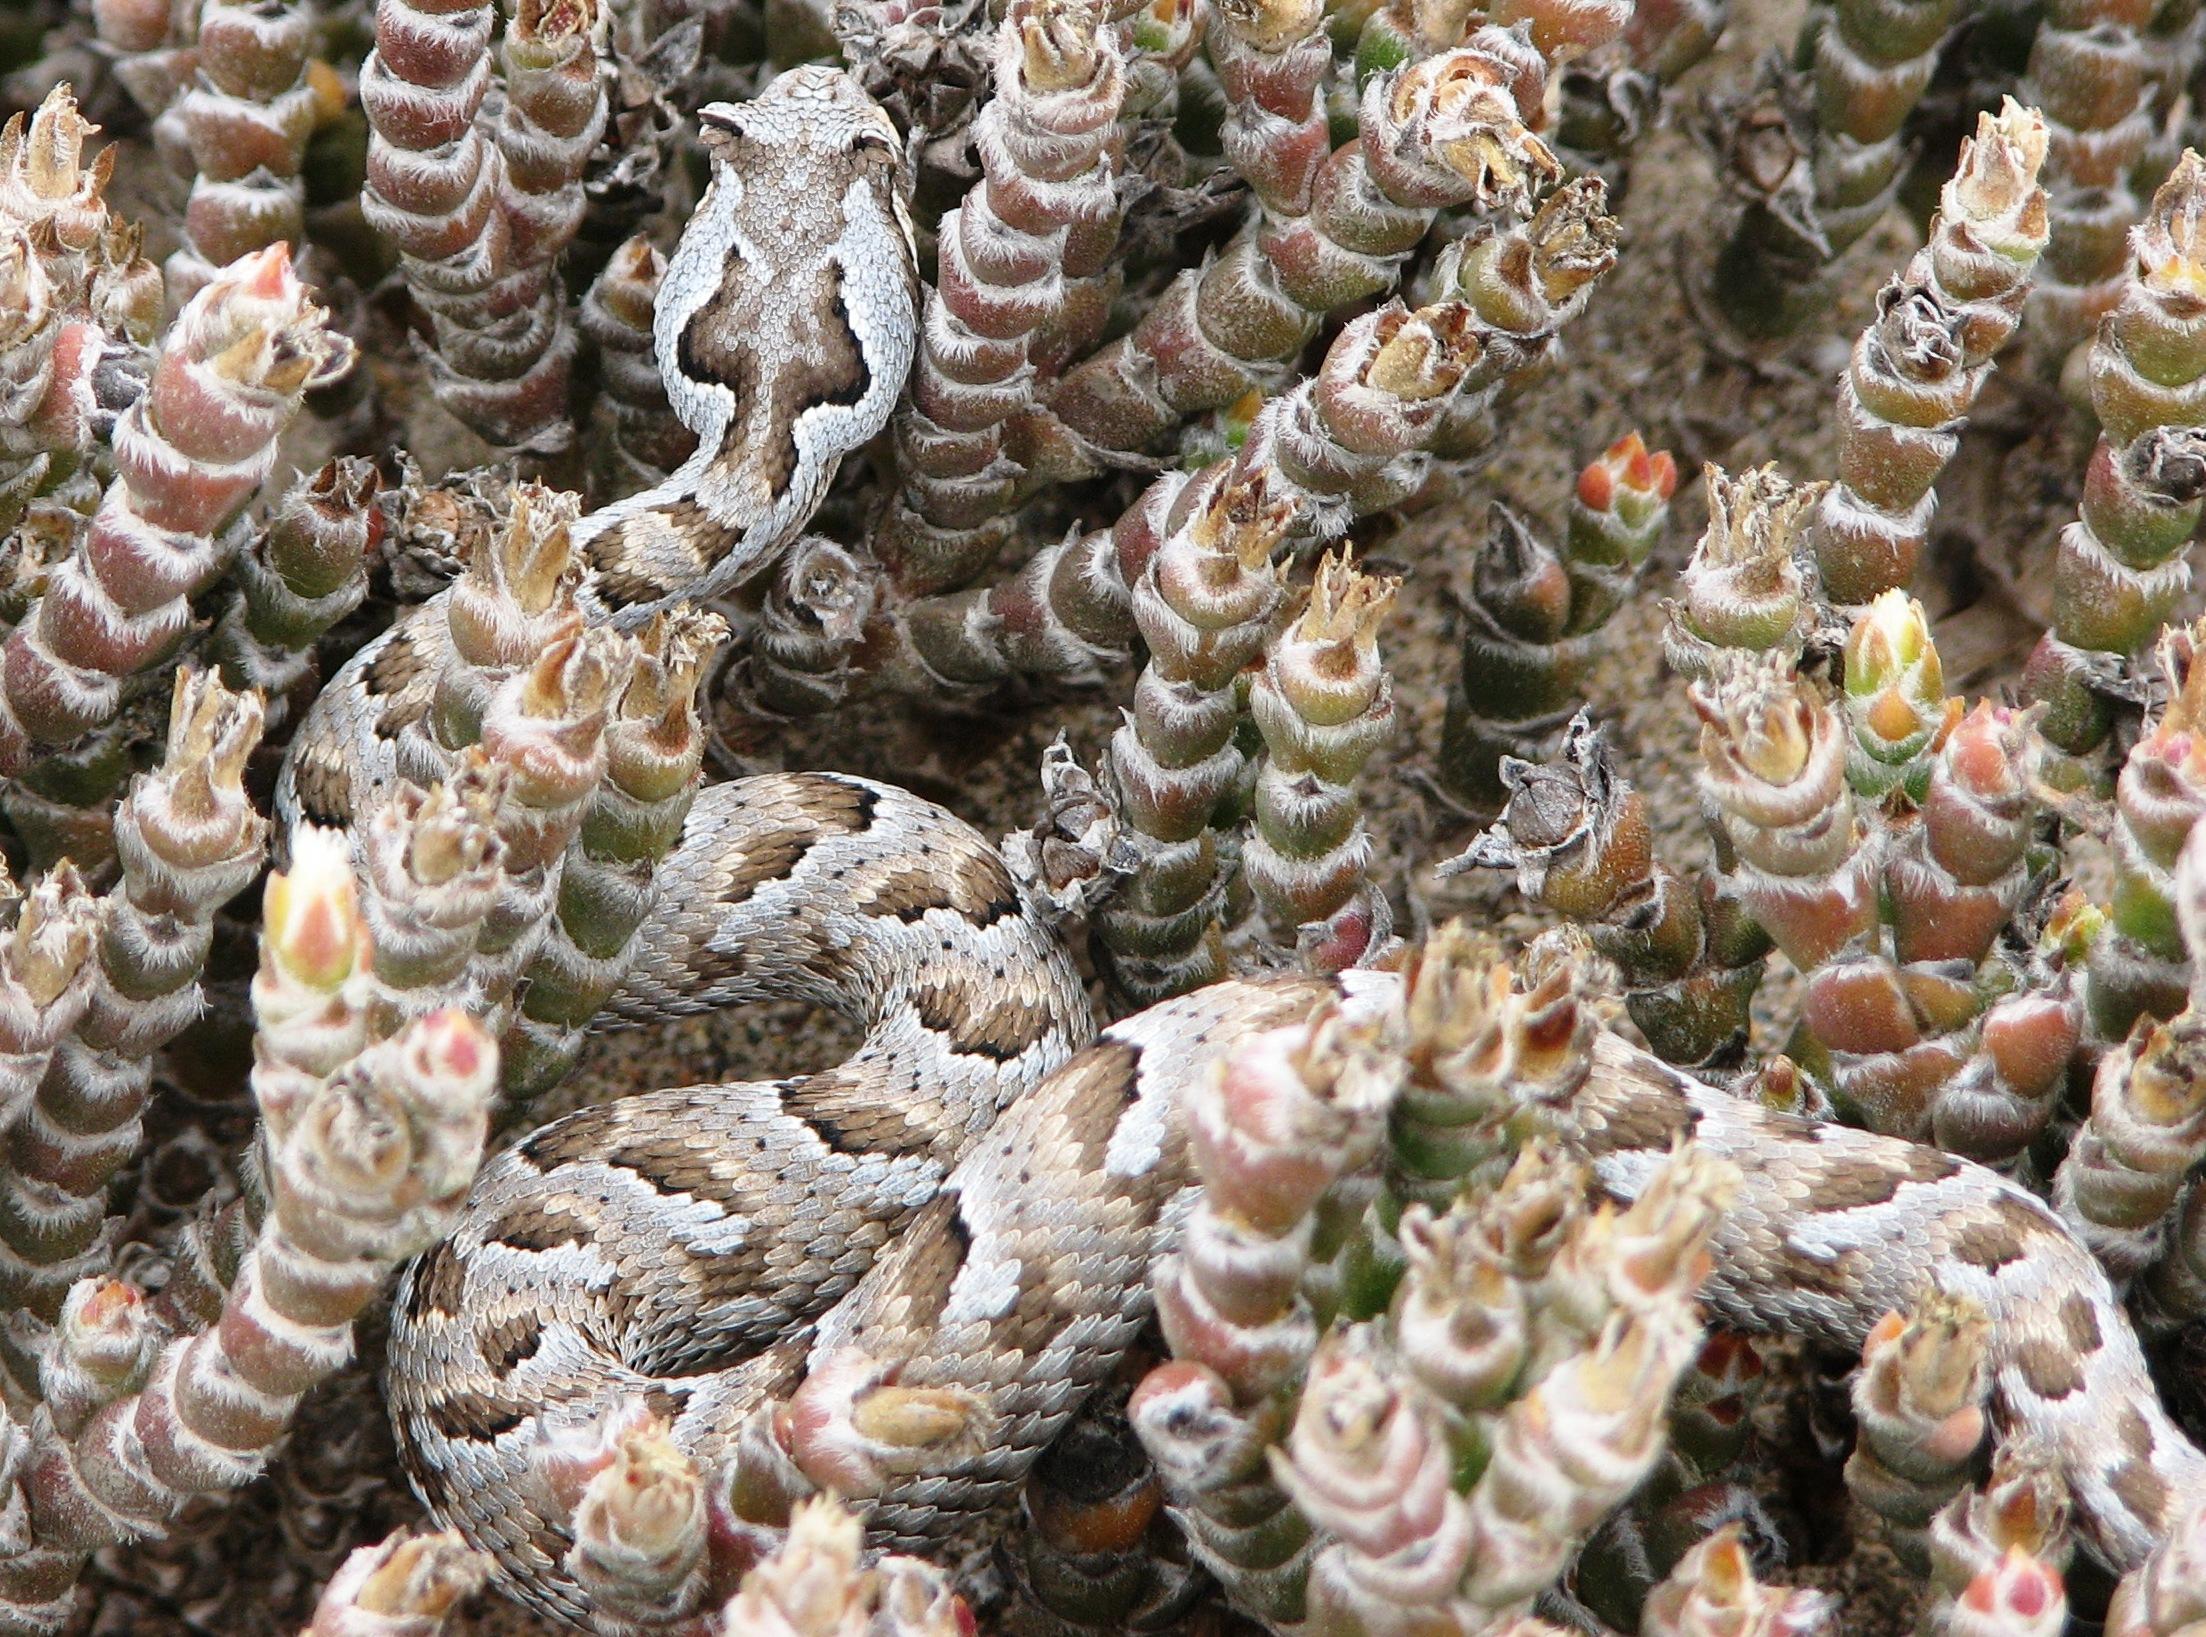 Progress Namibia - Mapping biodiversity in Namibia through Citizen Science